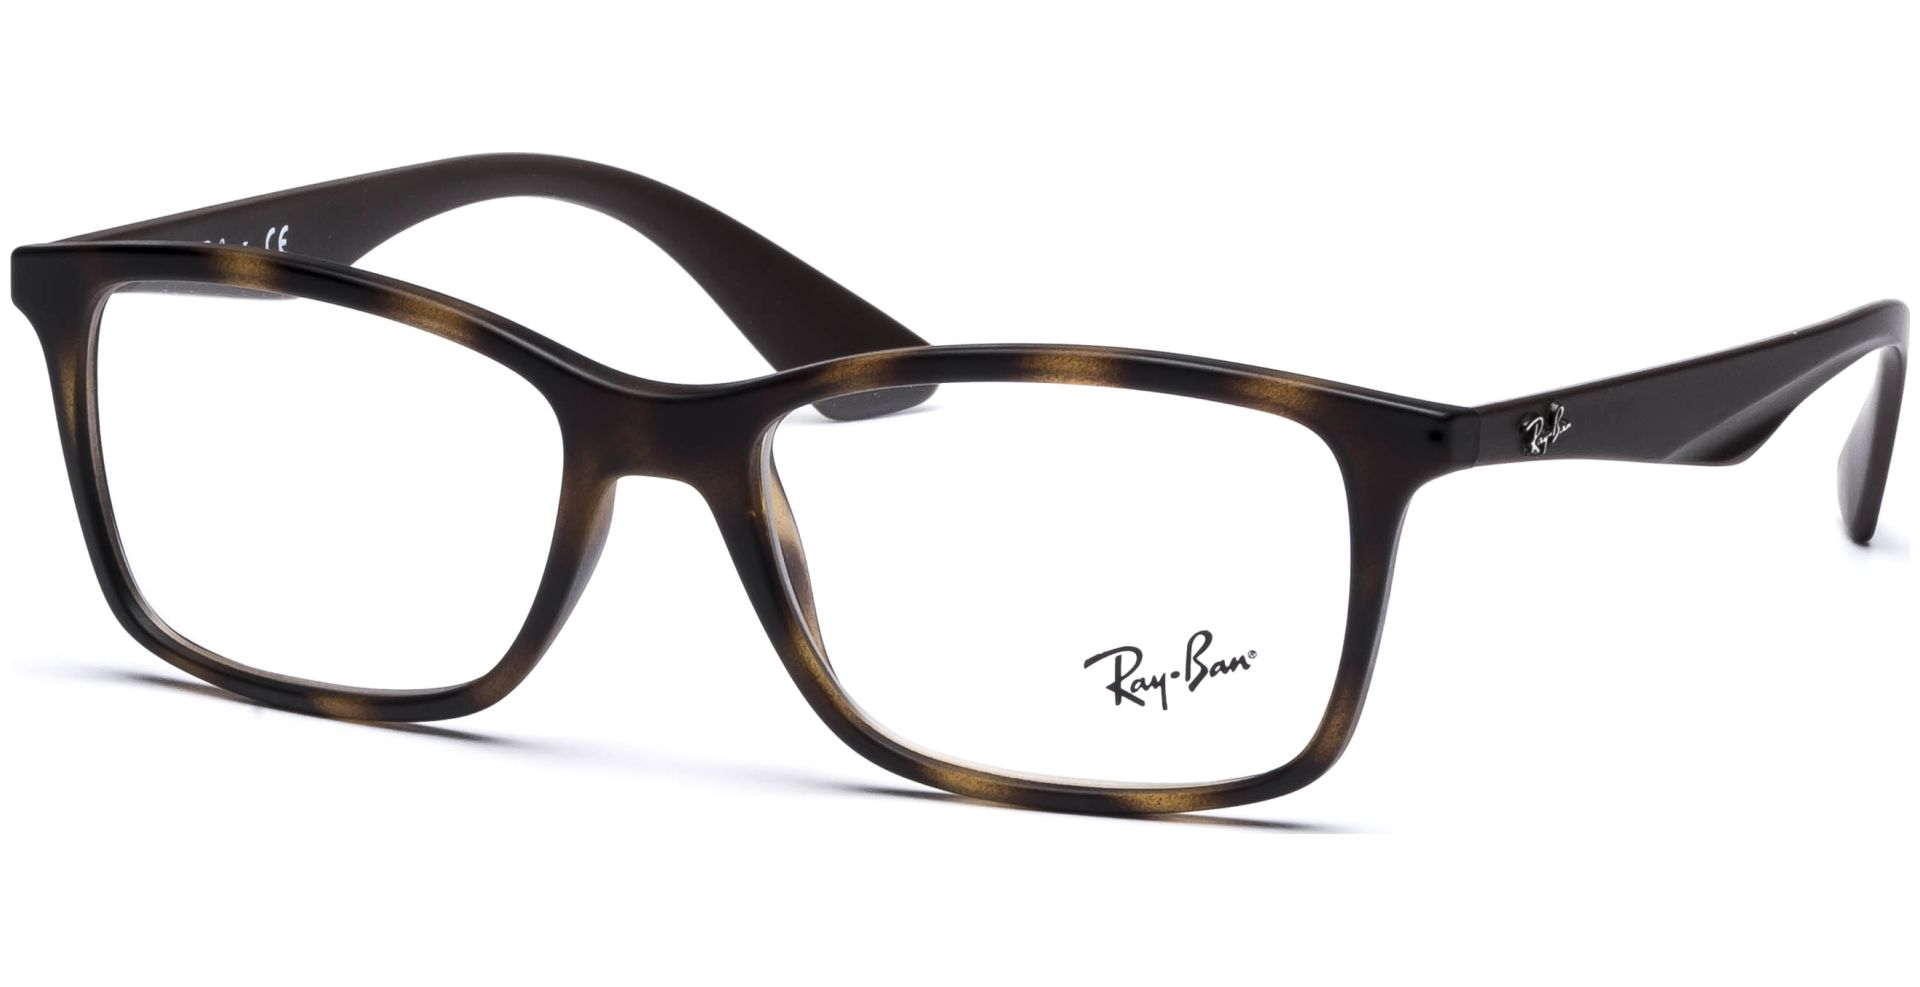 ray ban brille havanna matt